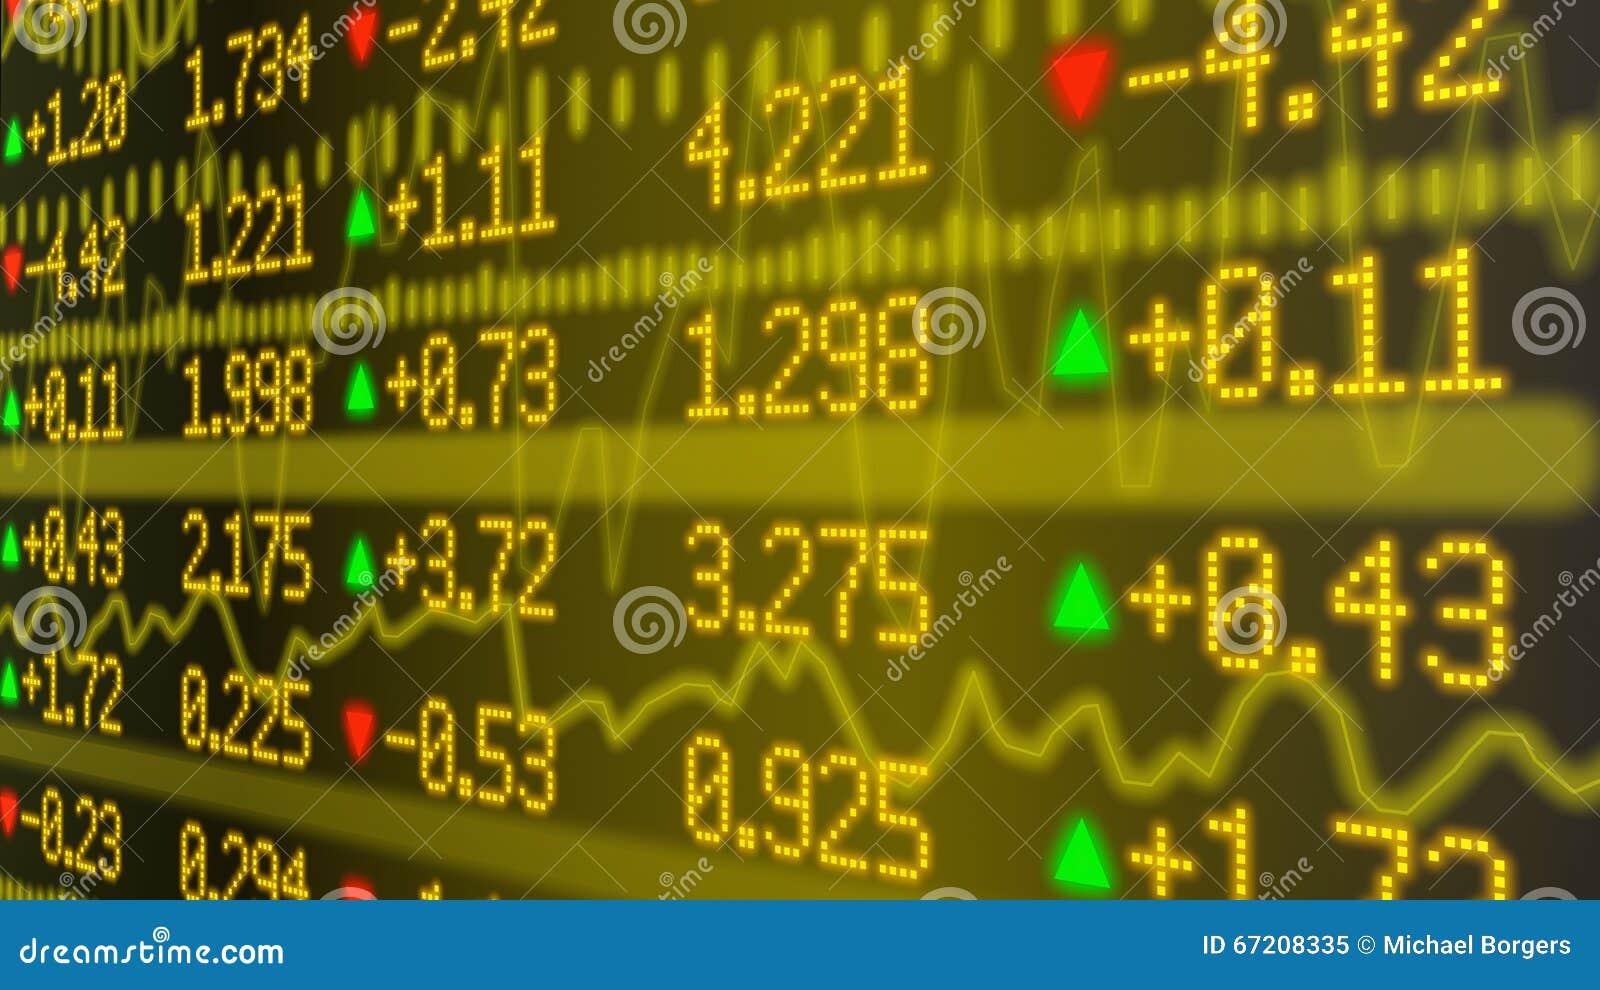 Stock Market Ticker Wall In Yellow Stock Illustration ...